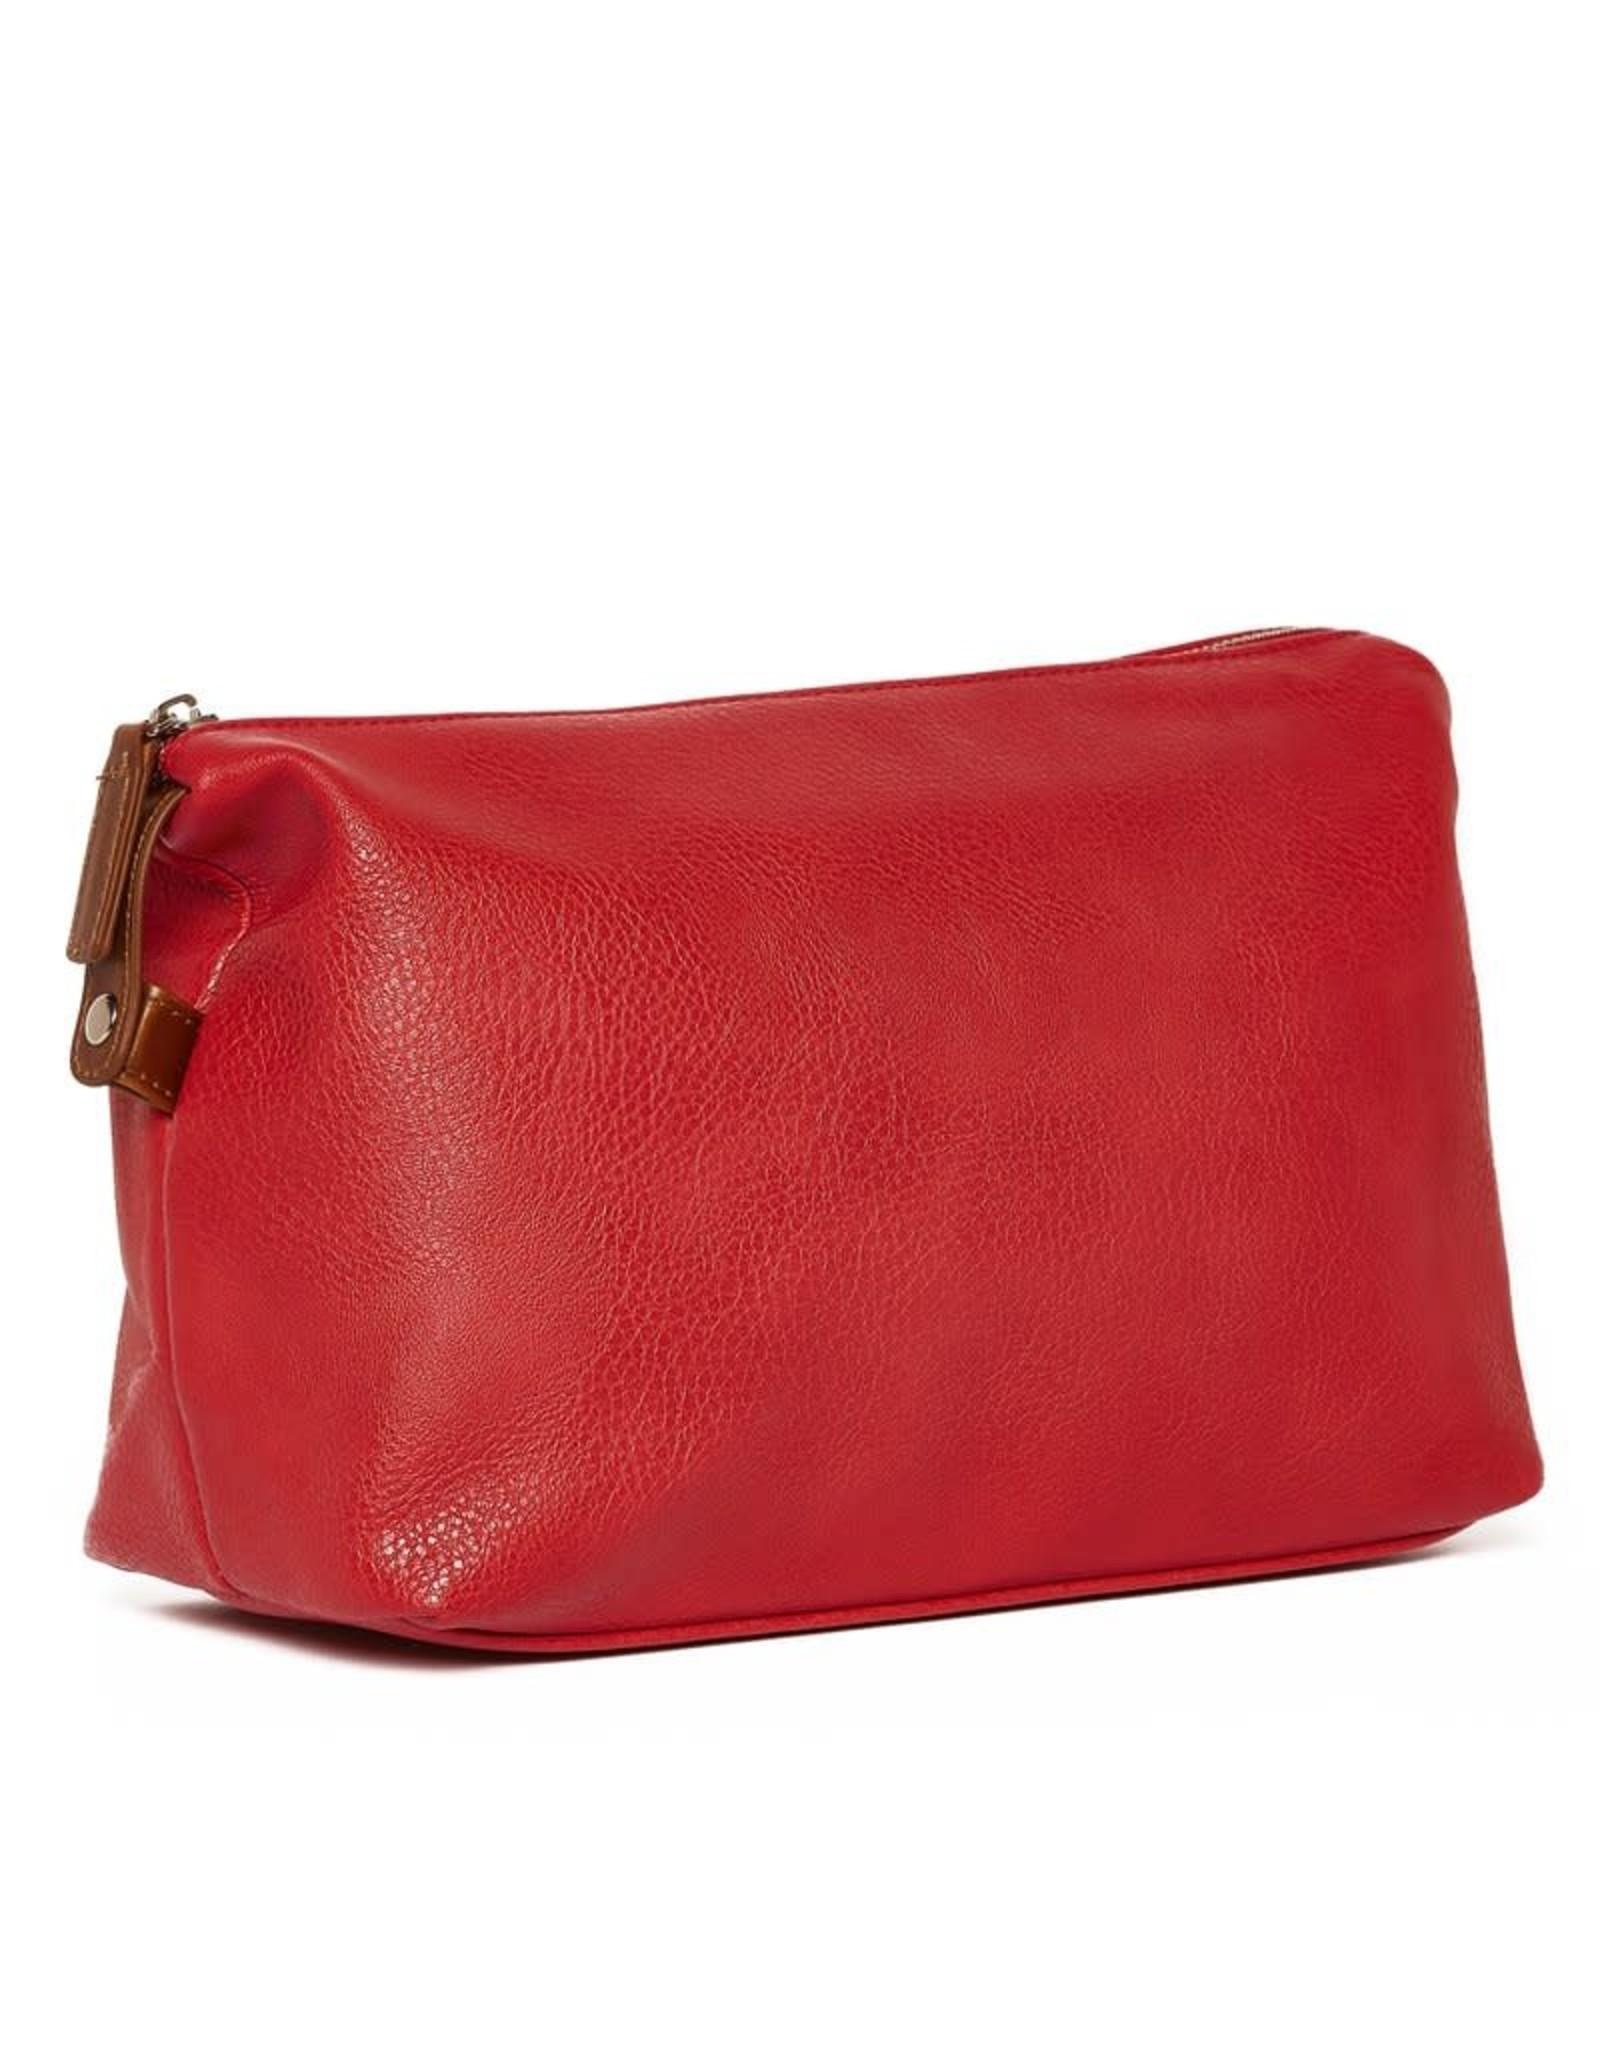 Brouk & Co Croft Dopp Kit Red